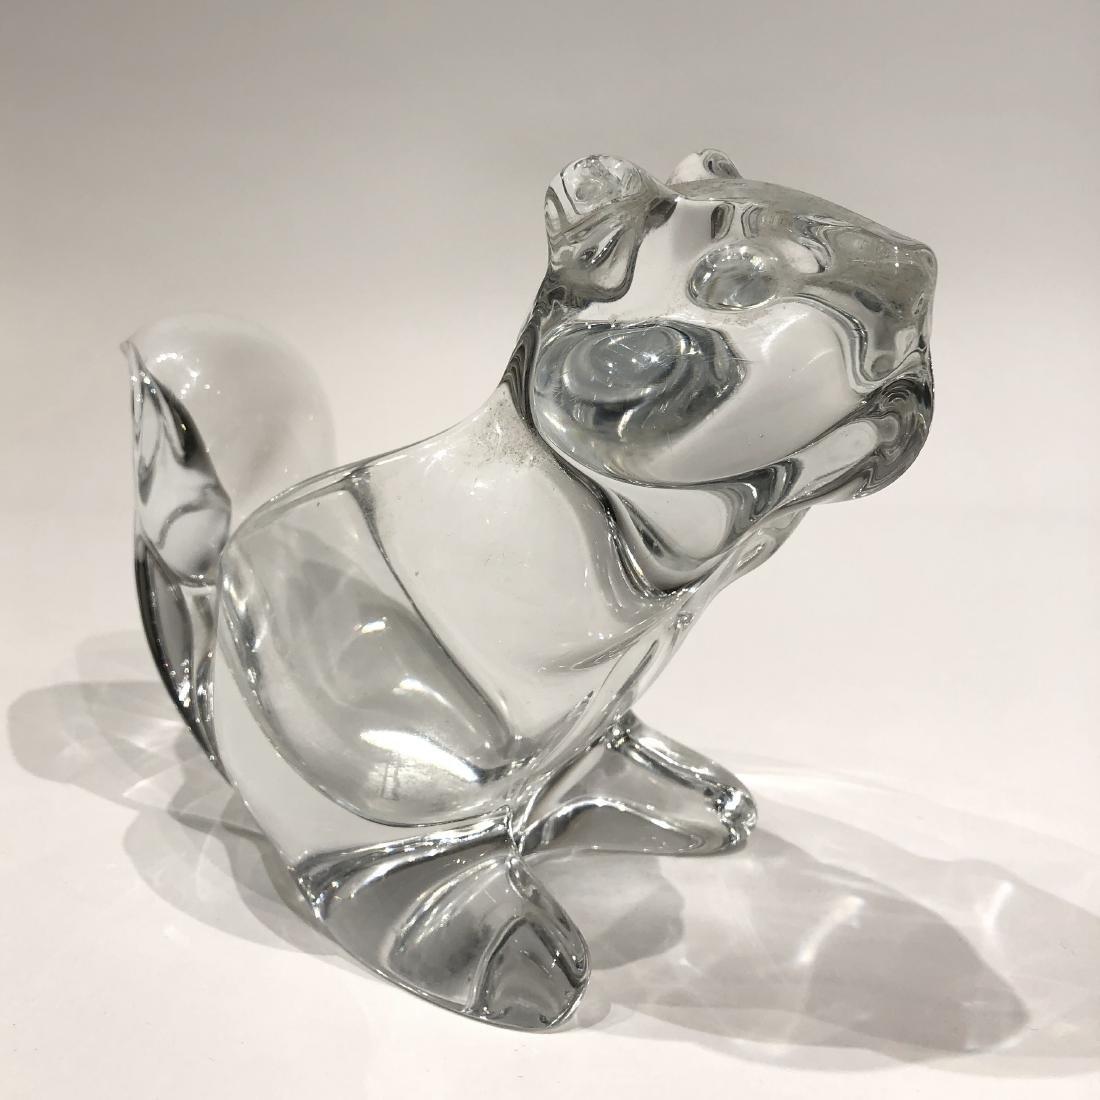 Japanese Sasaki Crystal Objects - 5